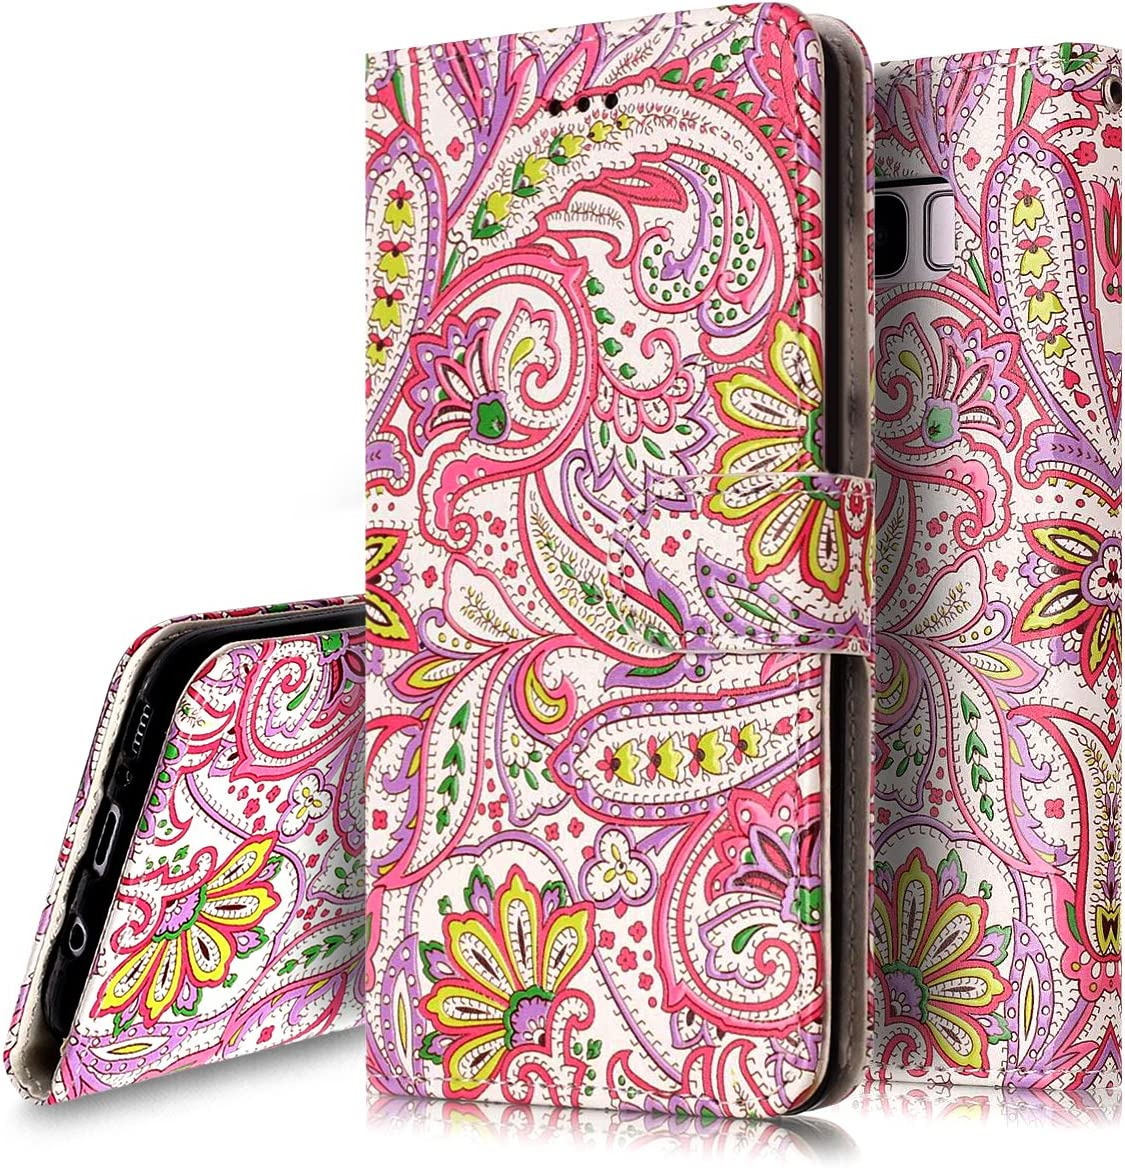 Galaxy Max 54% OFF S8 Case Wallet Lea PHEZEN Colorful Very popular! Floral